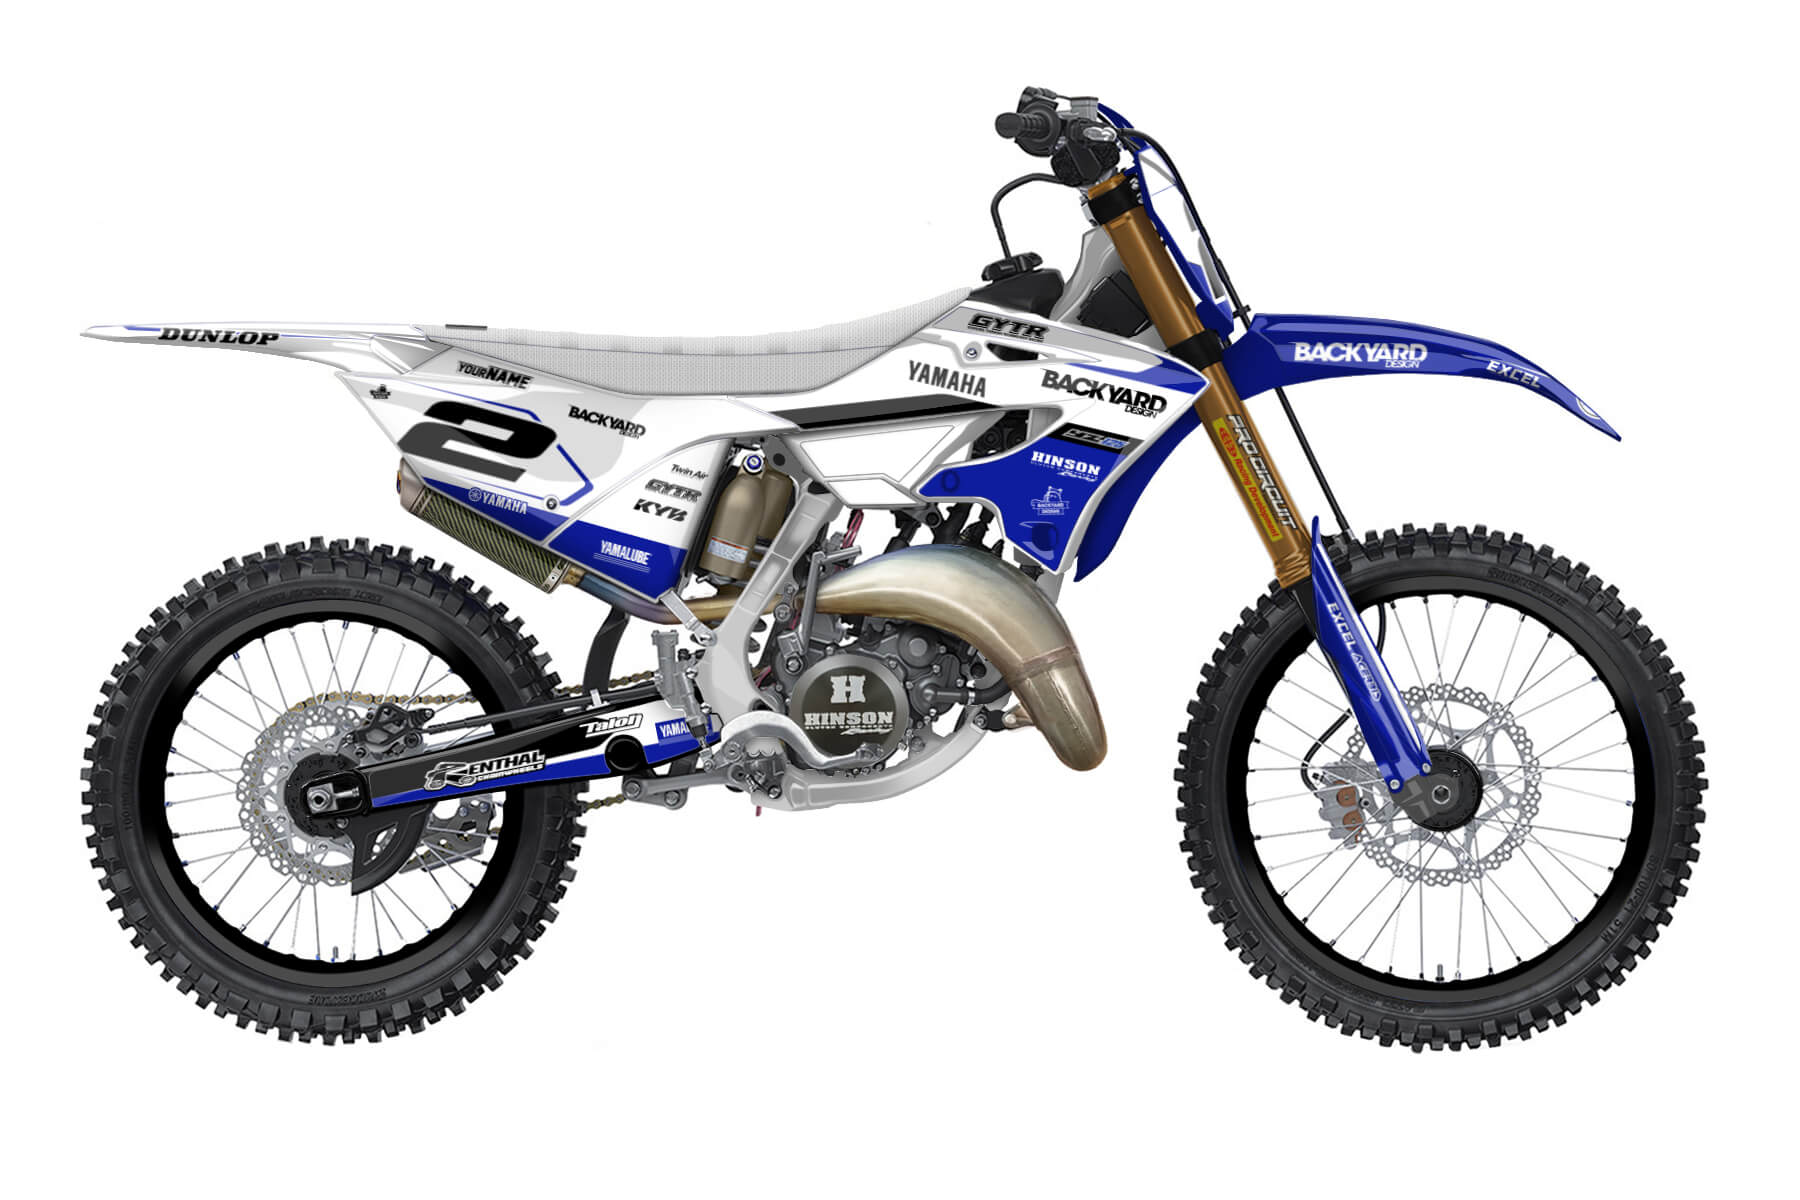 Yamaha YZ 250 - 2022 - Backyard Design - Mx Dekor - General Pro